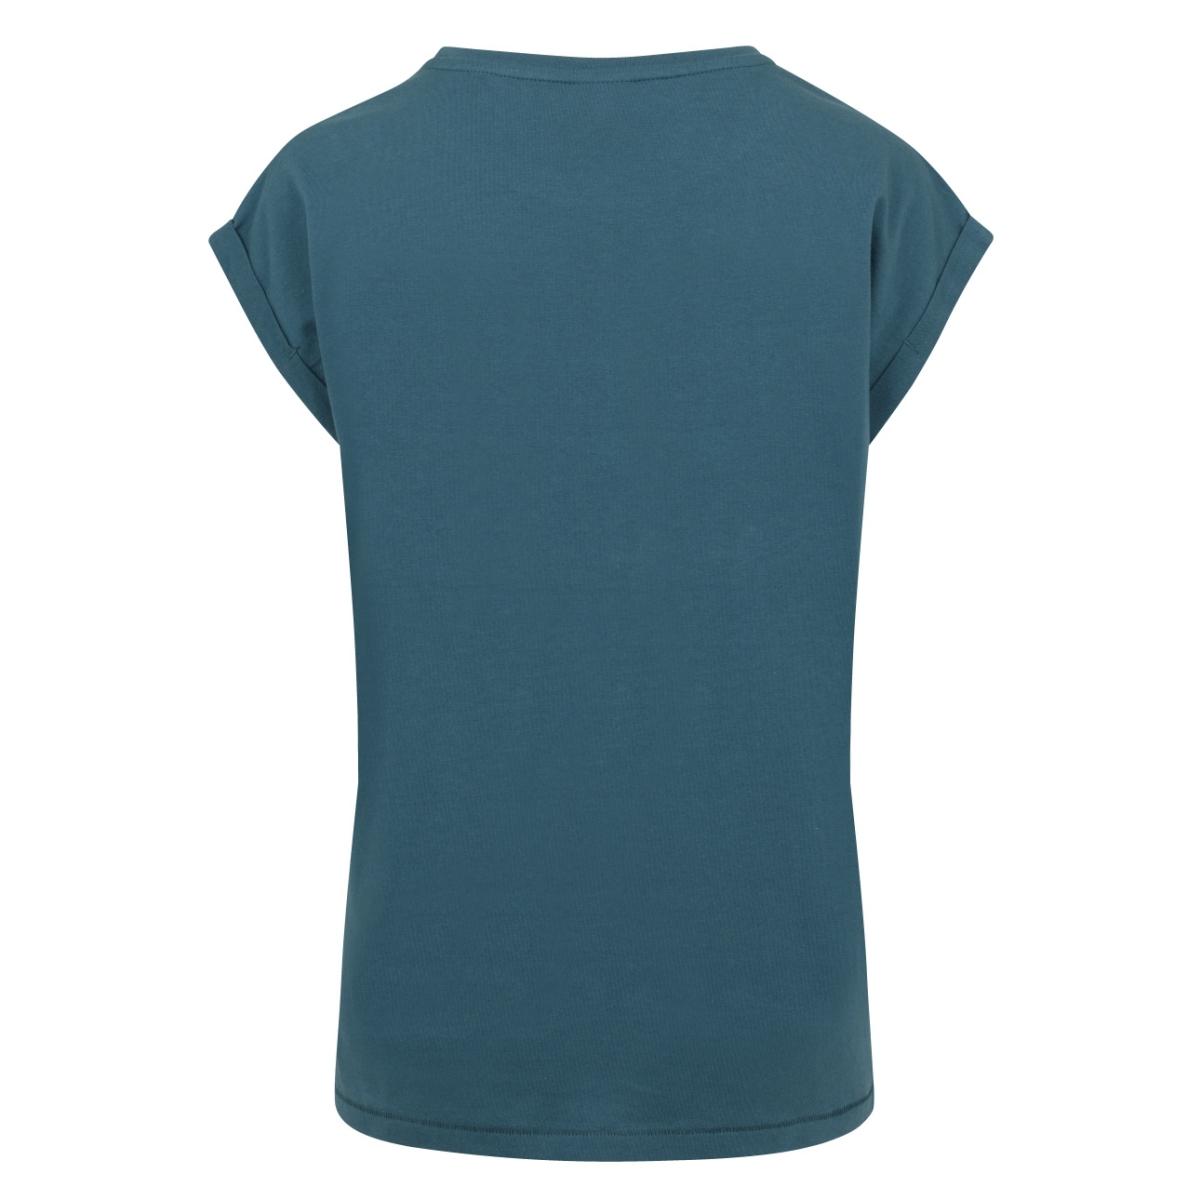 tb771 tee teal urban classics t-shirt teal